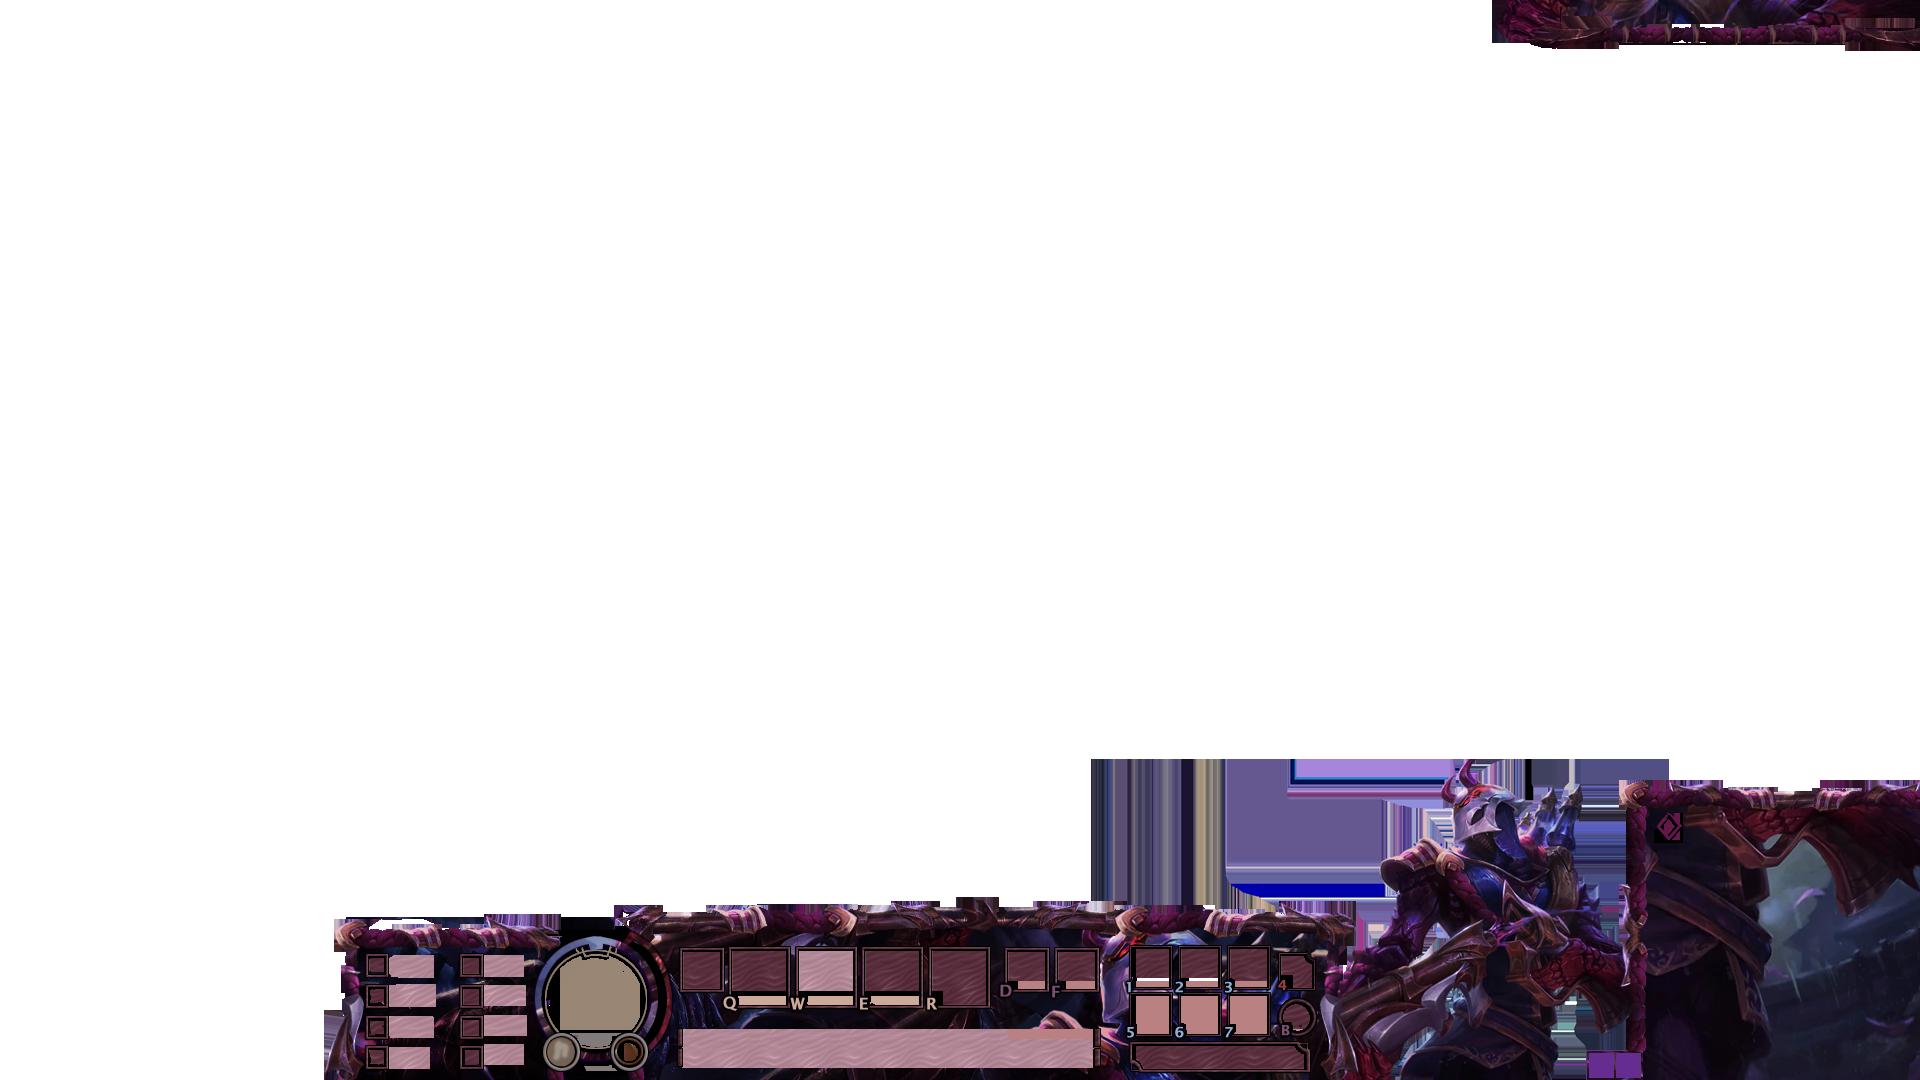 Bloodmoon Jhin Stream Overlay Overlays Streaming Artwork